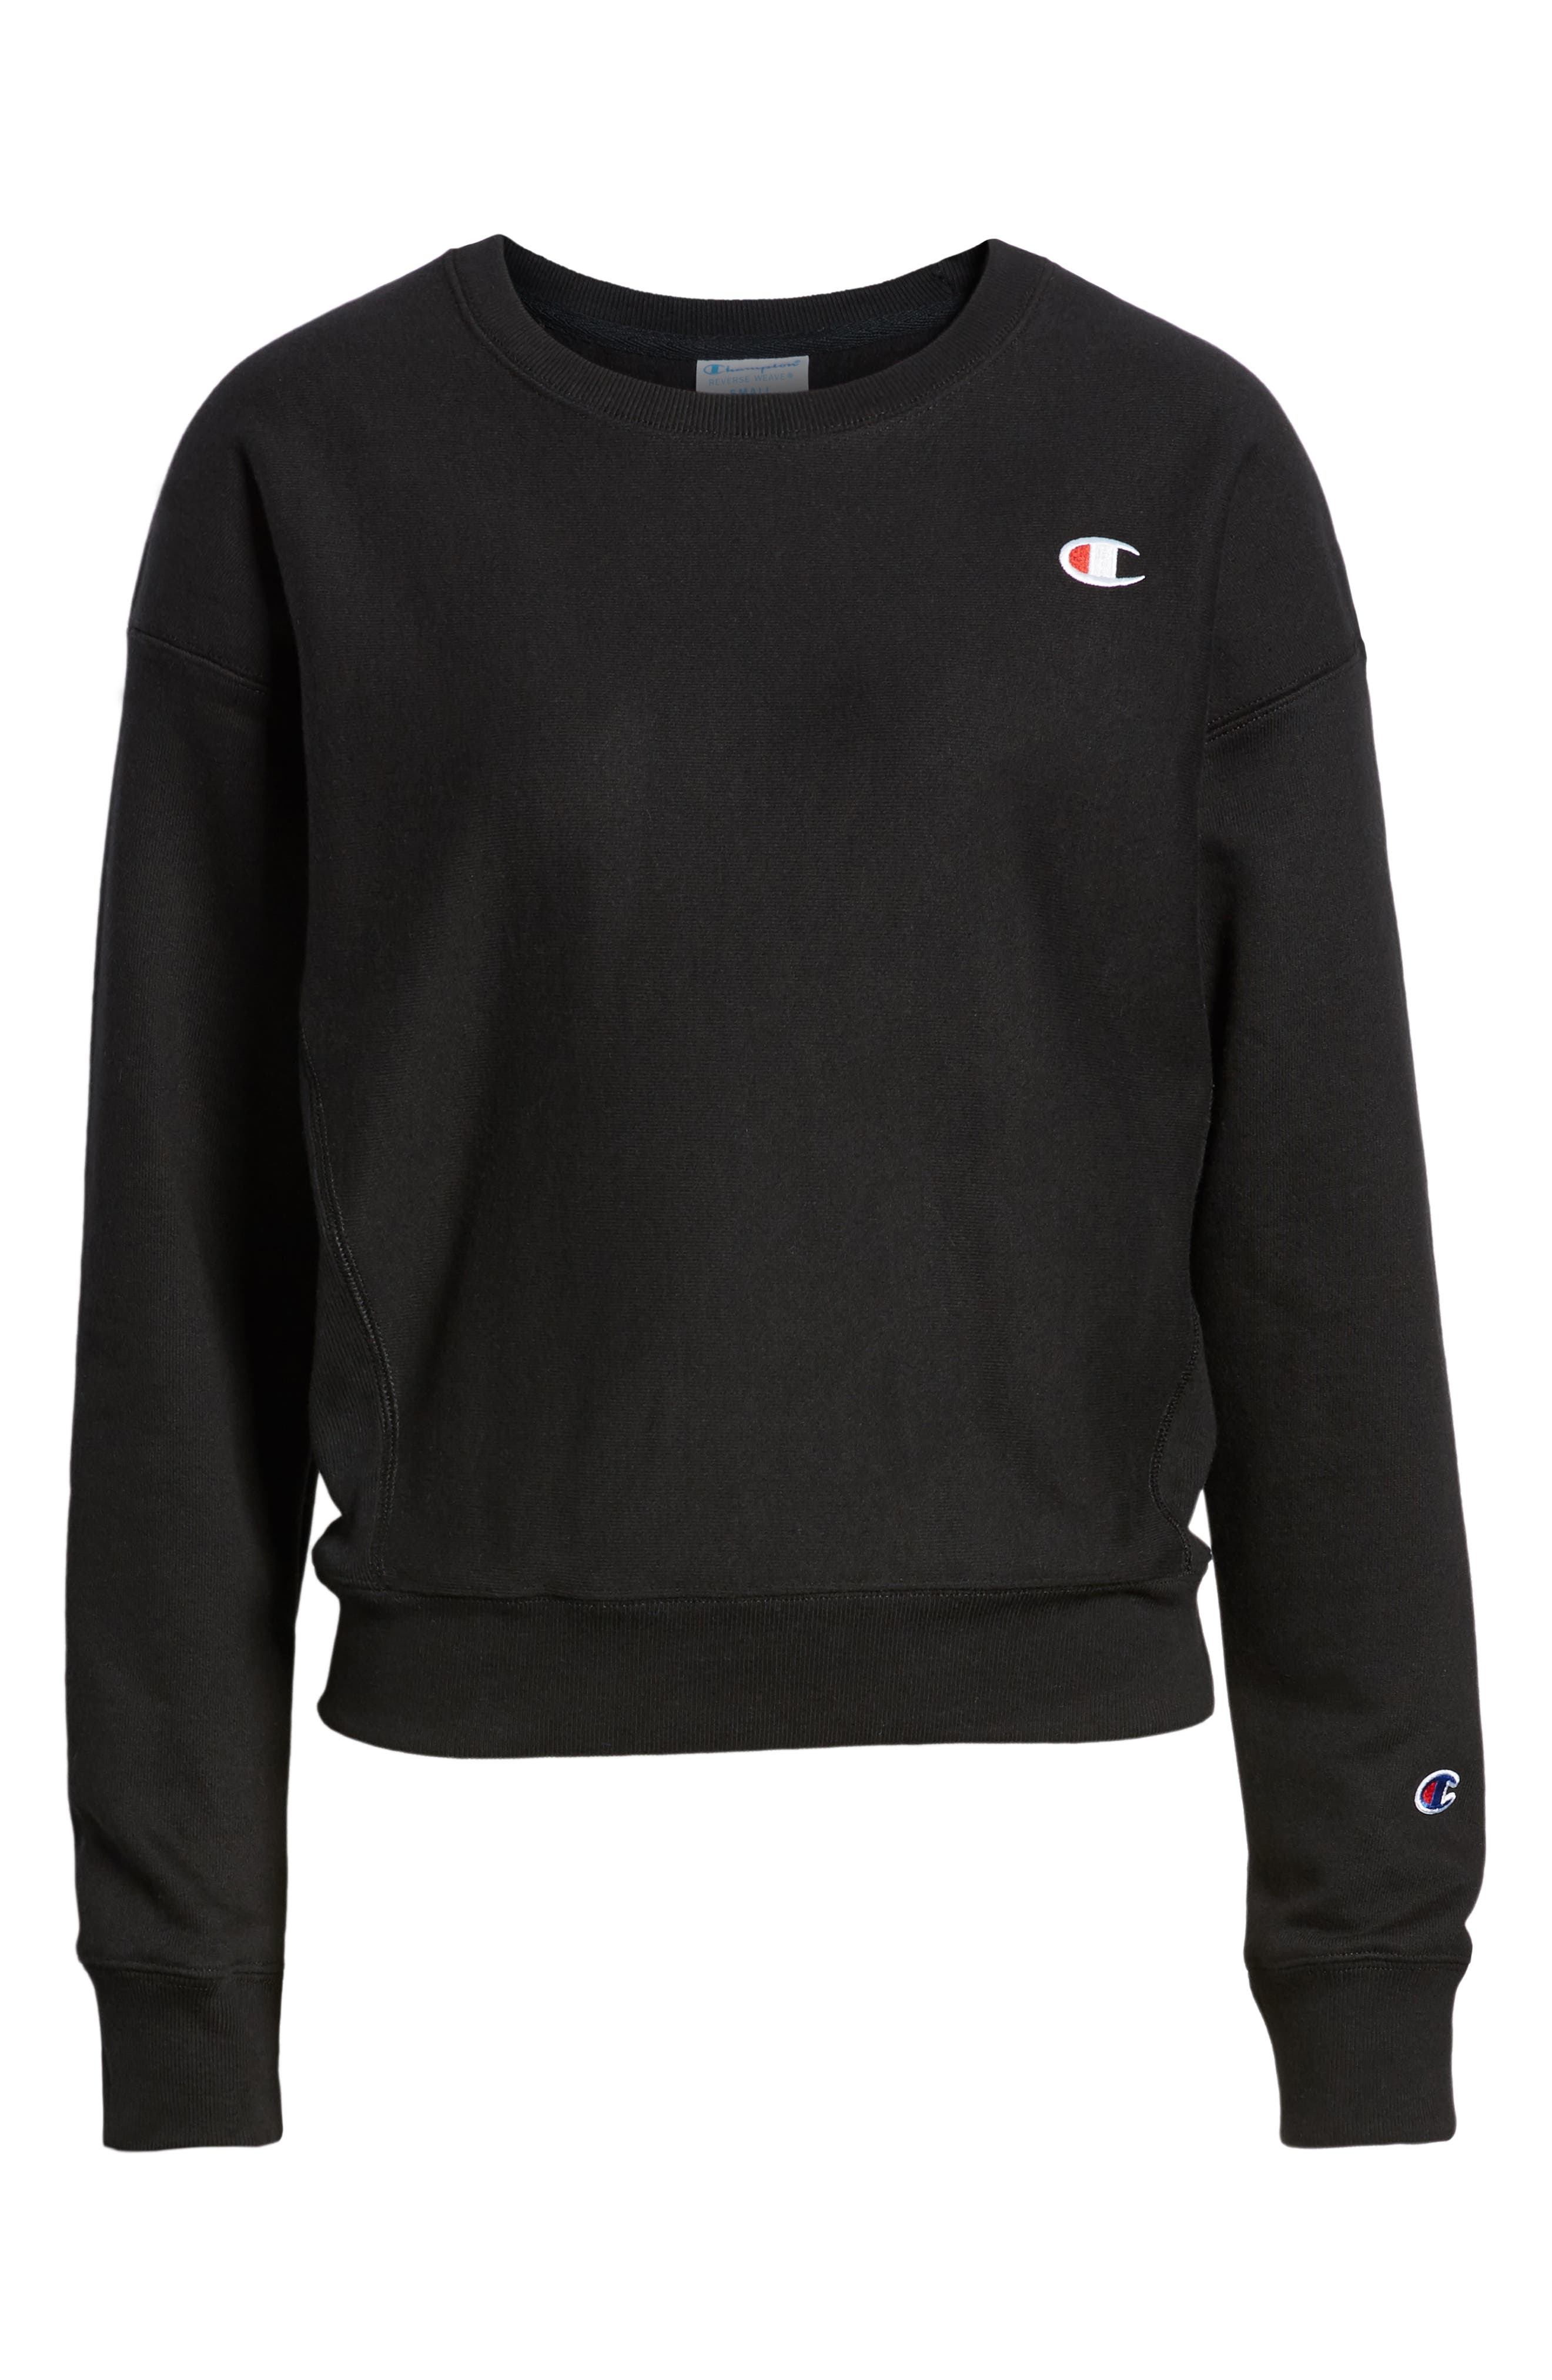 CHAMPION, Reverse Weave Sweatshirt, Alternate thumbnail 5, color, BLACK